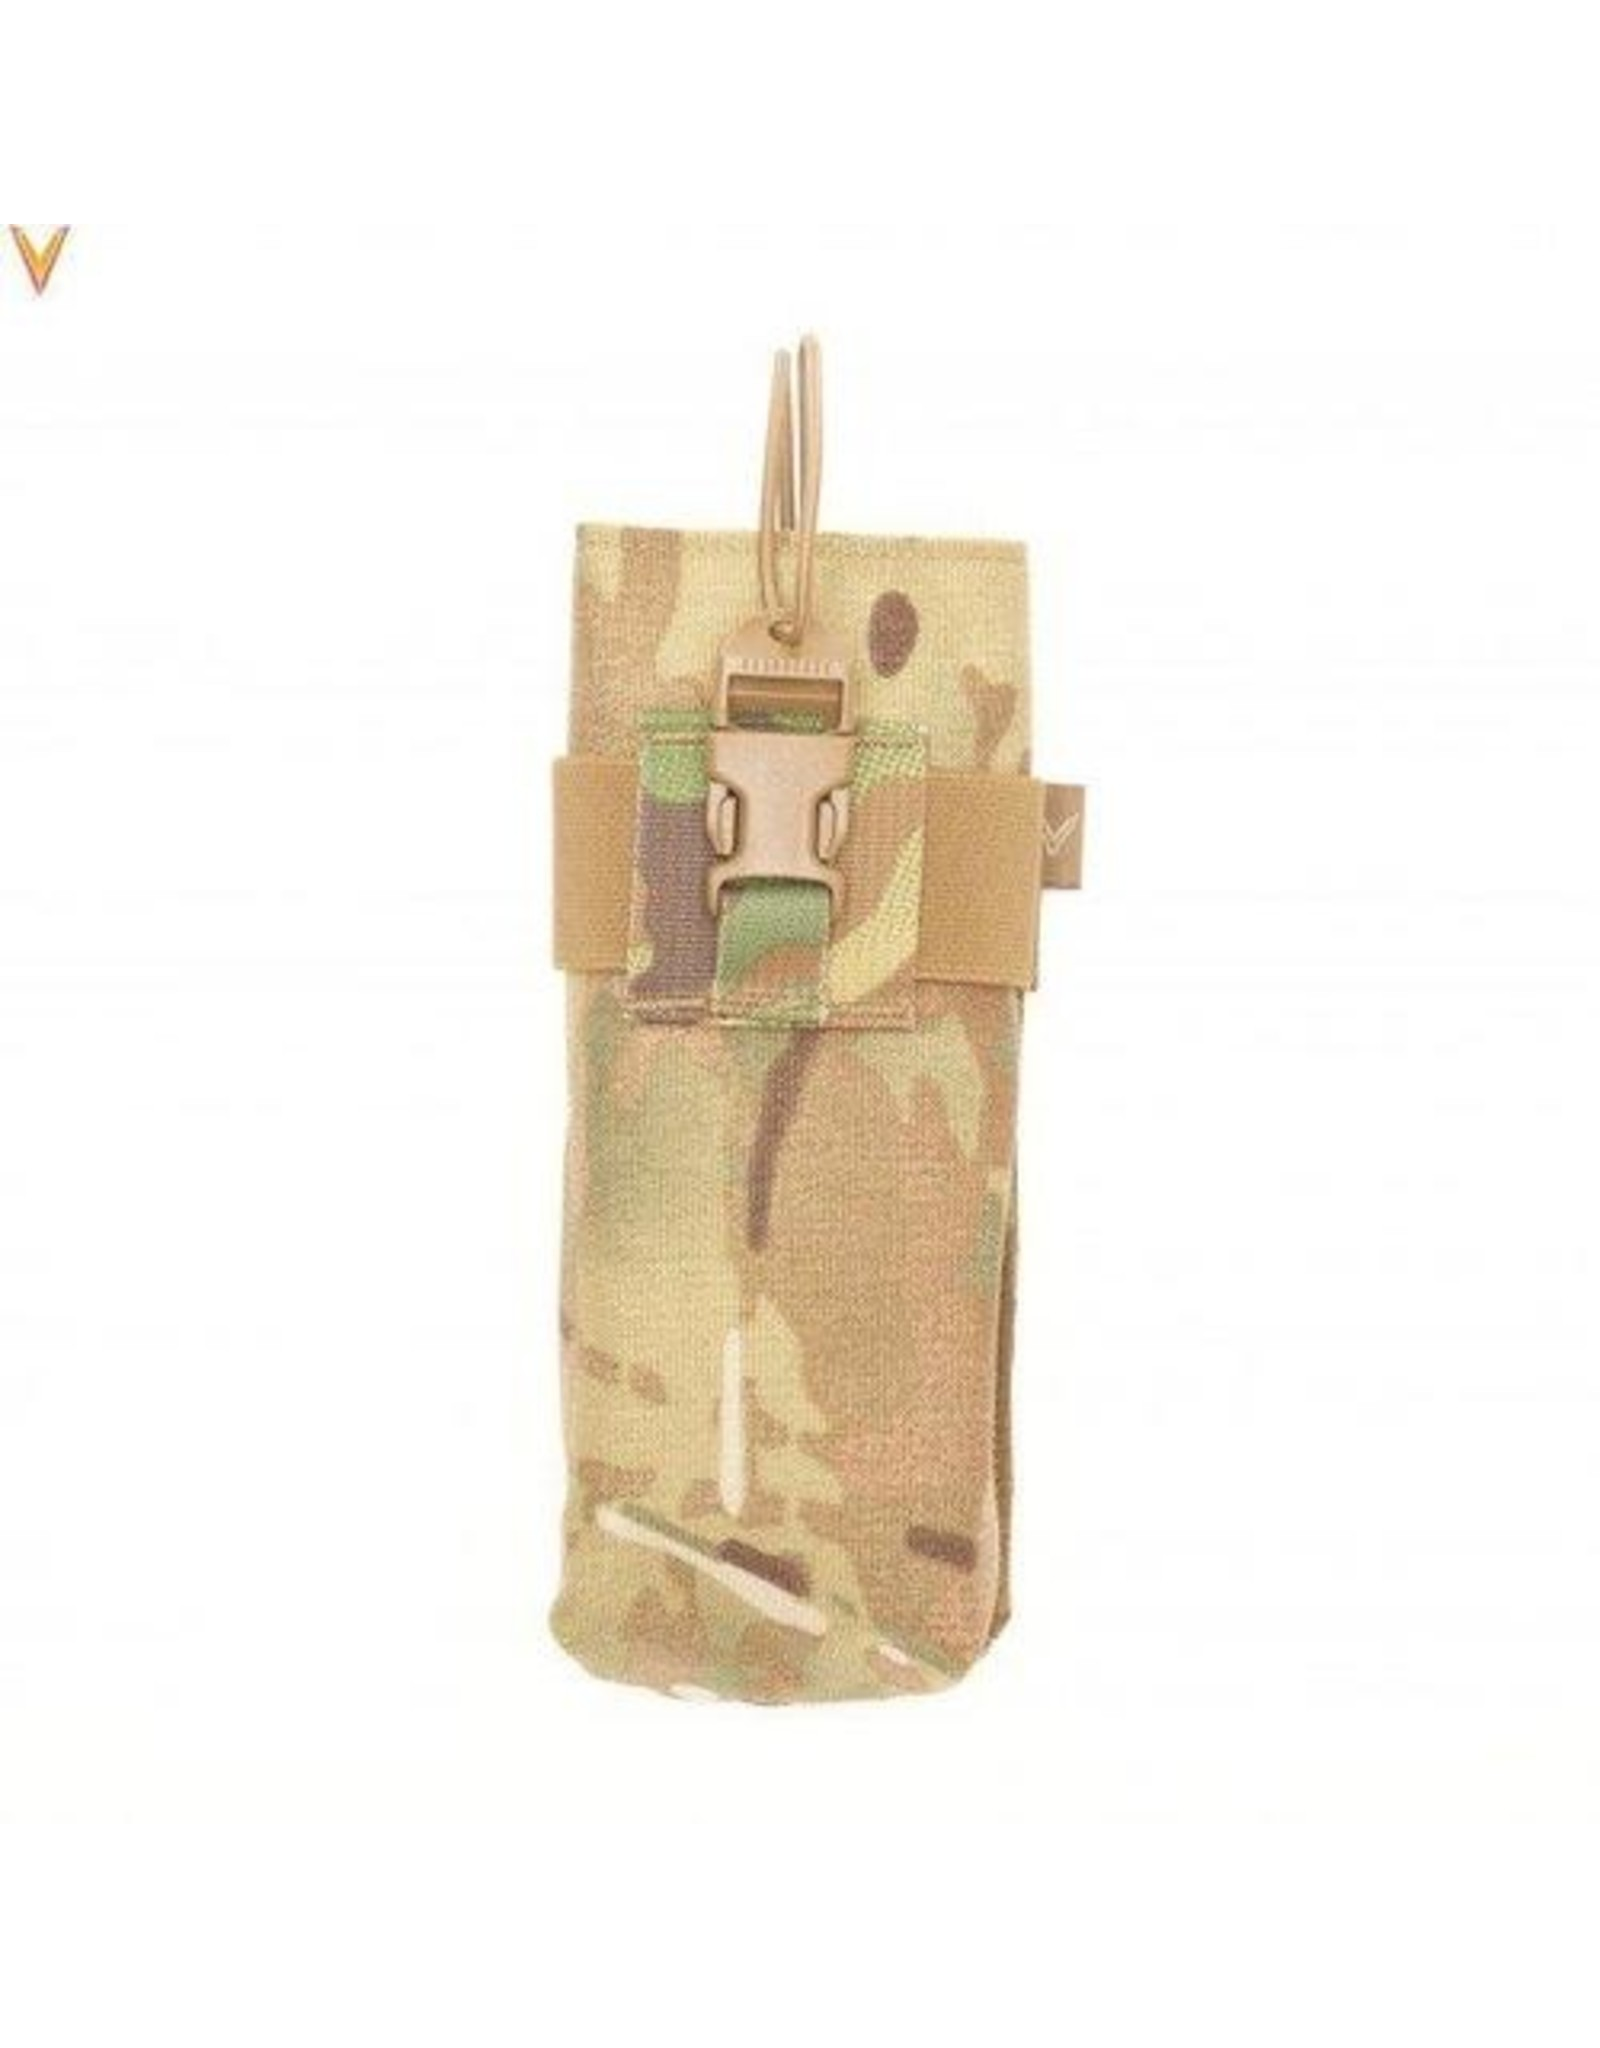 VELOCITY SYSTEMS HELIUM WHISPER MBTIR/152 RADIO POUCH